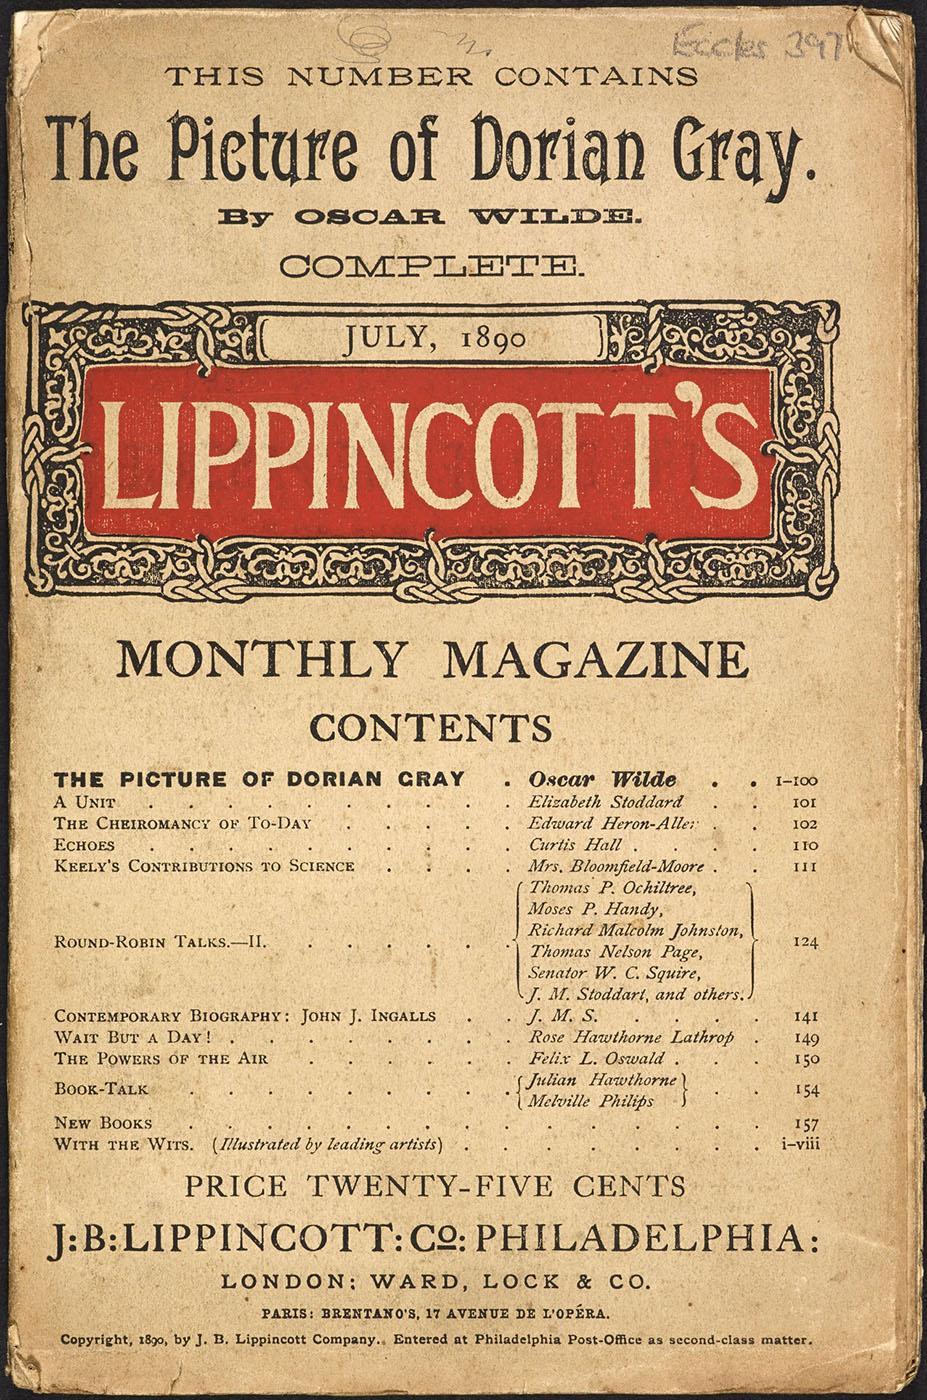 Oscar Wilde. El retrato de dorian Gray. Revista mensual de Lippincott. 1890.